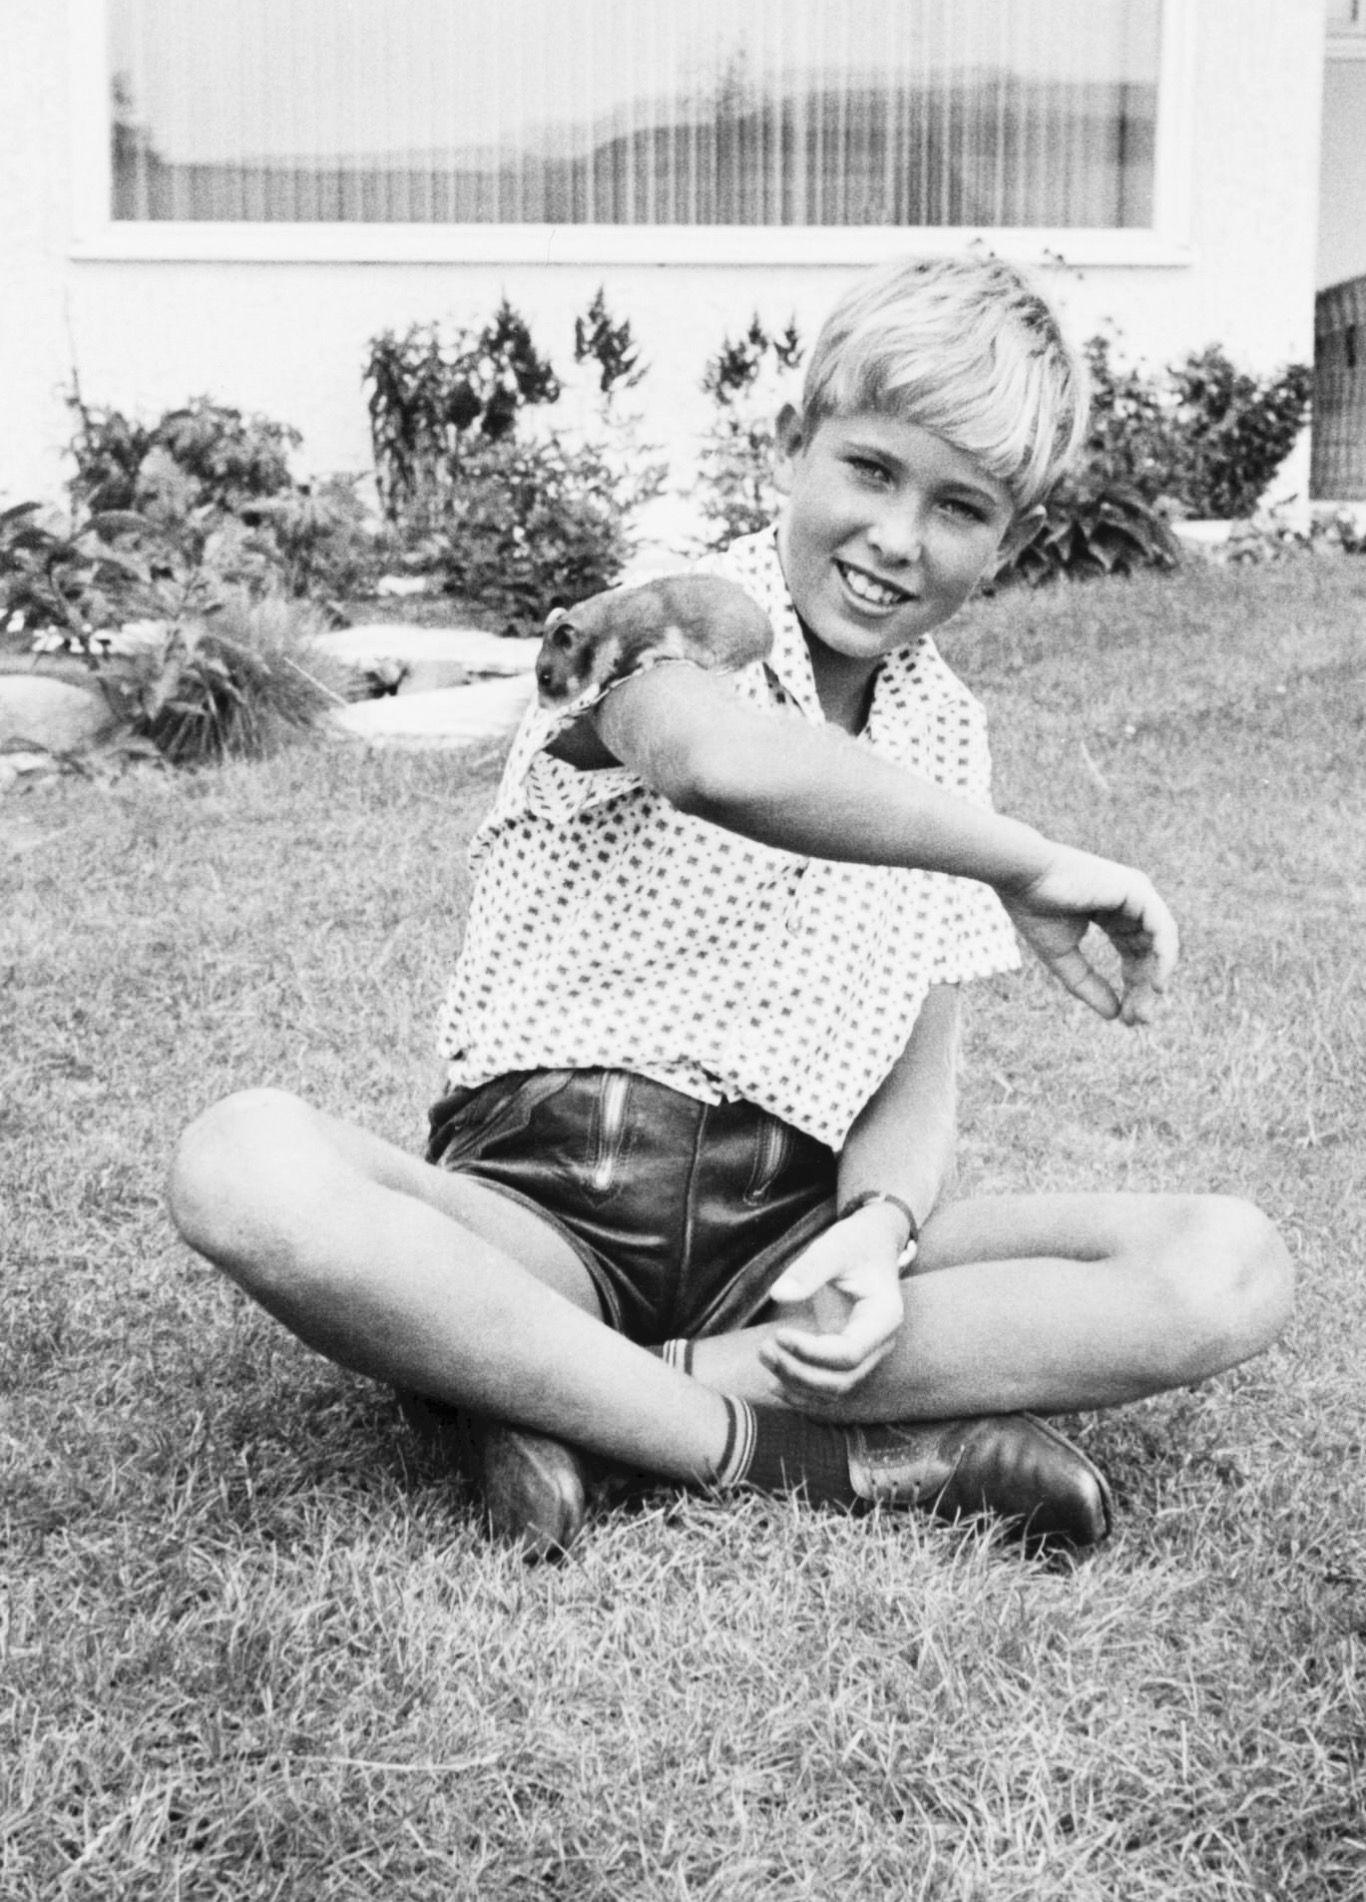 teen-boys-shorts-short-preety-pinay-huge